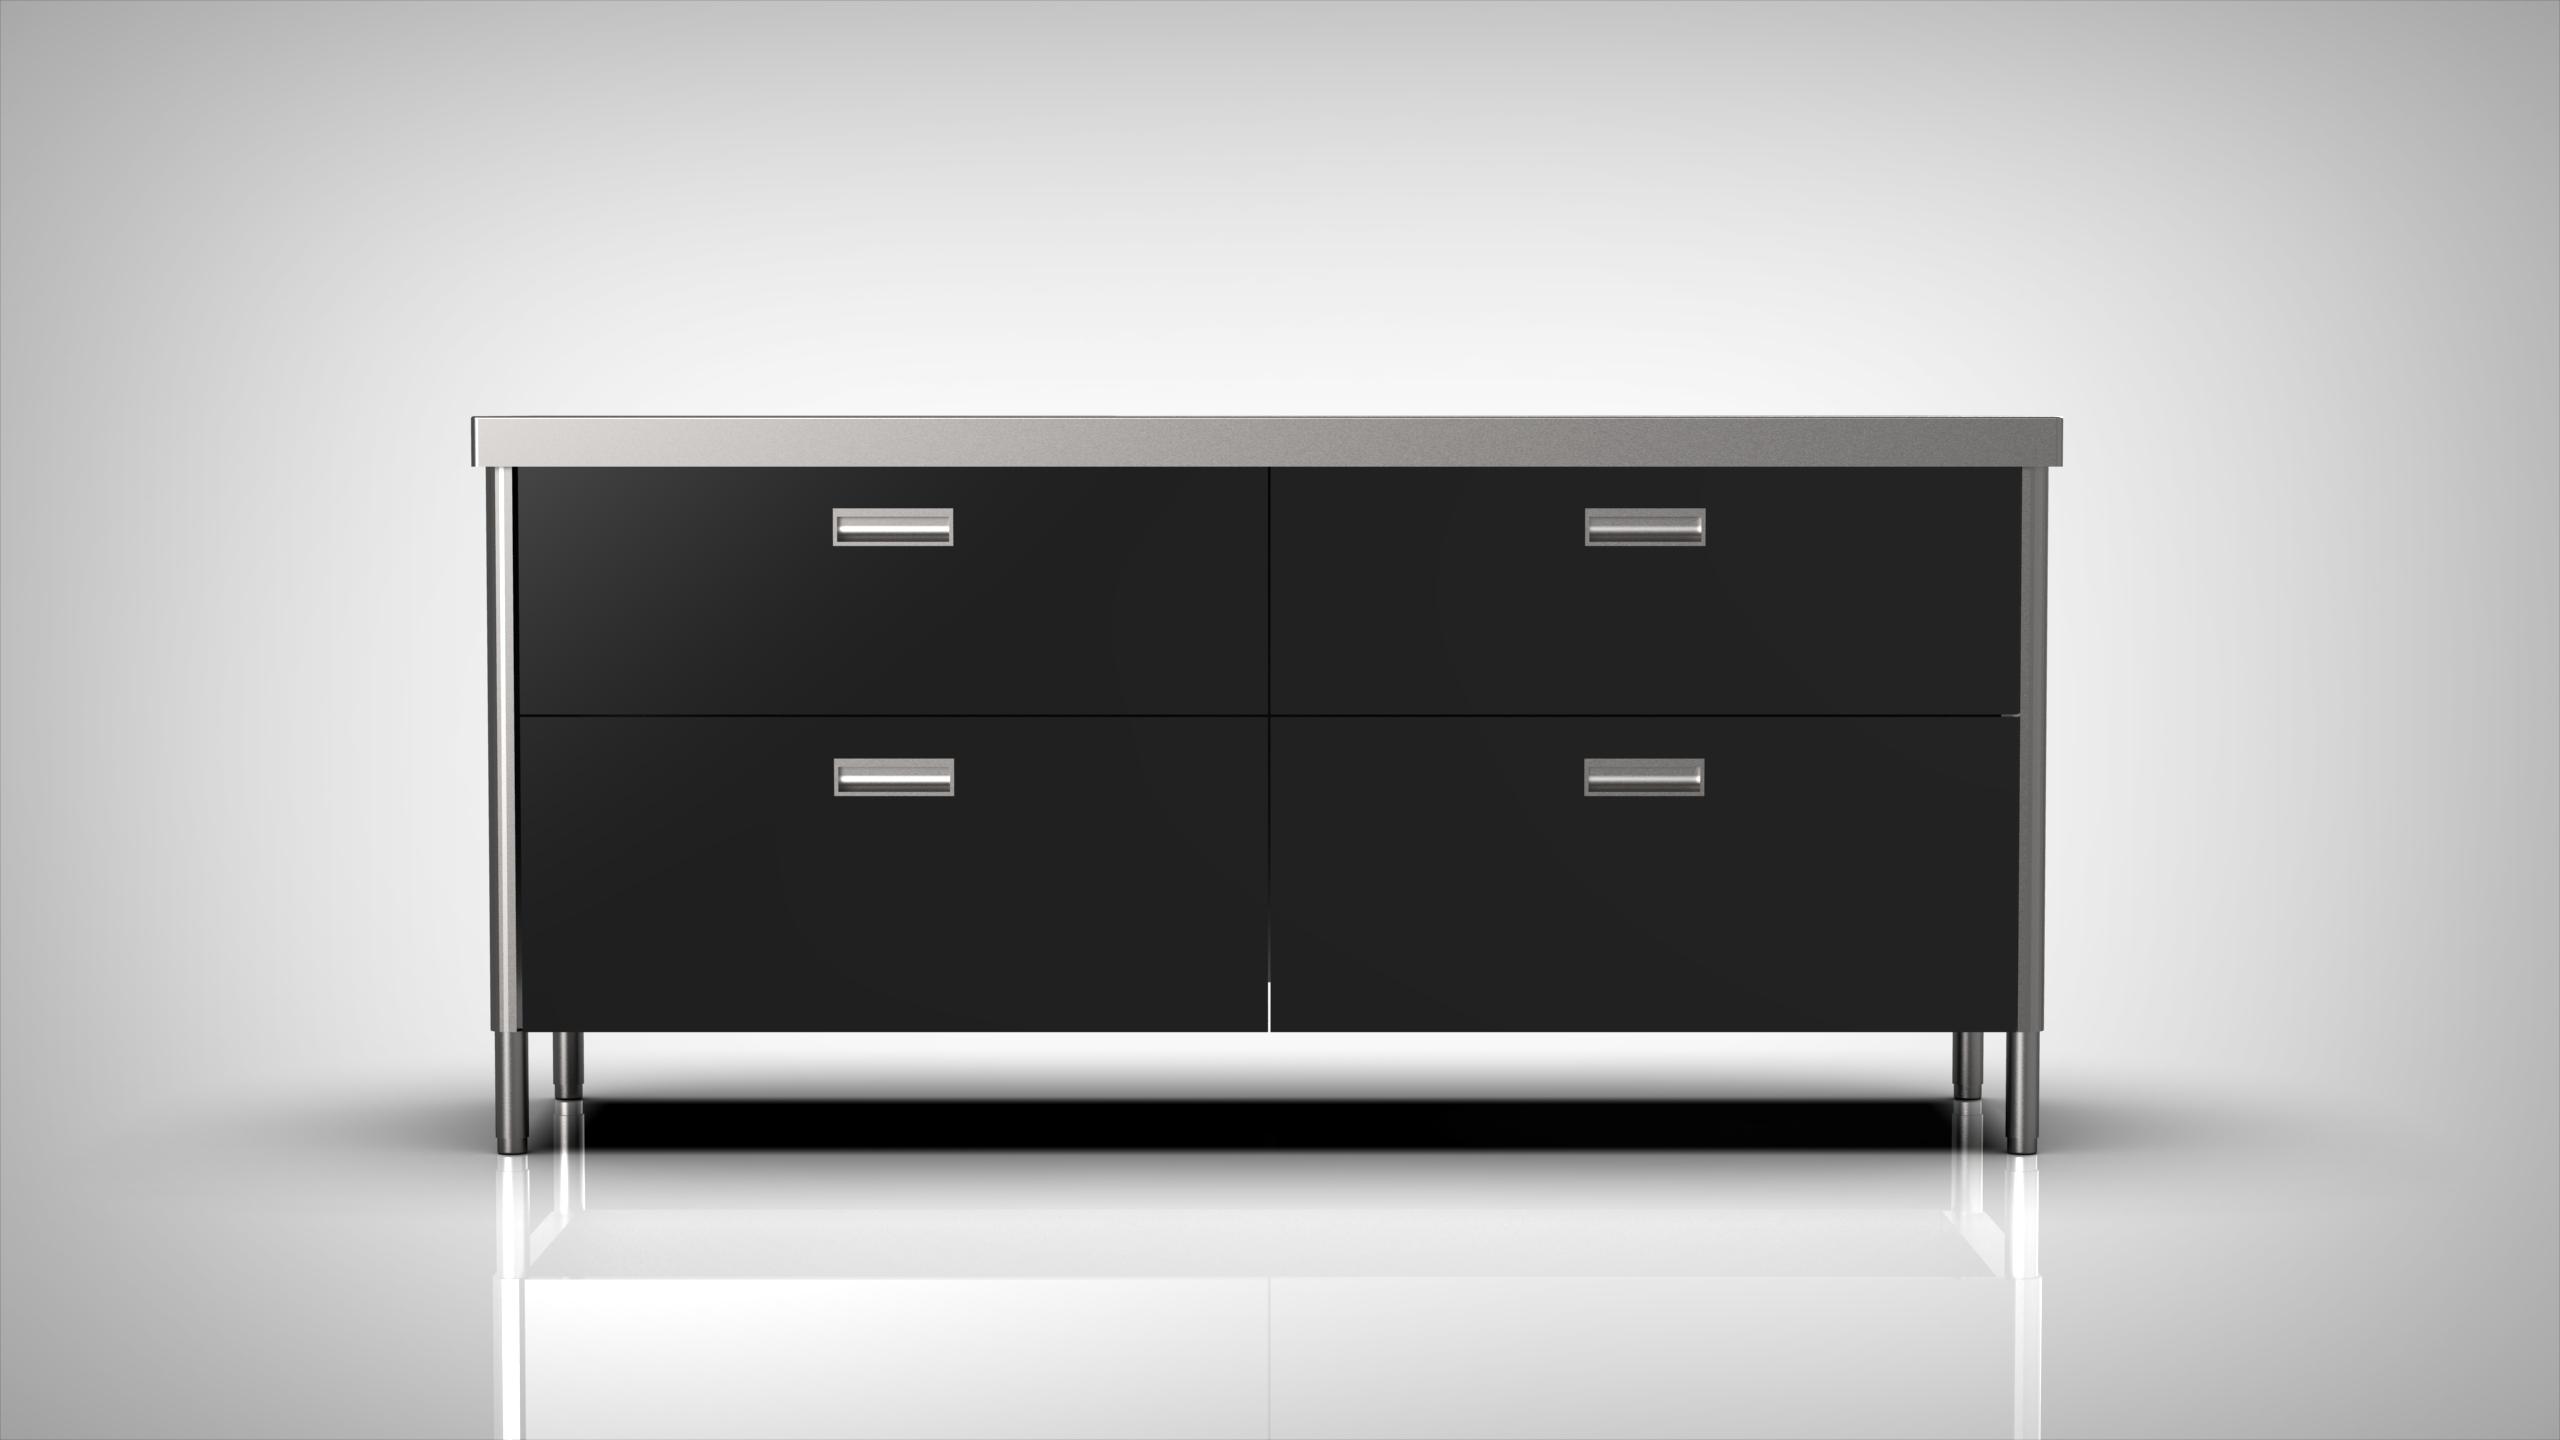 Arca Cucine Italy - Levanto - Modulo 190 - drawers - Sink 190 - Nero